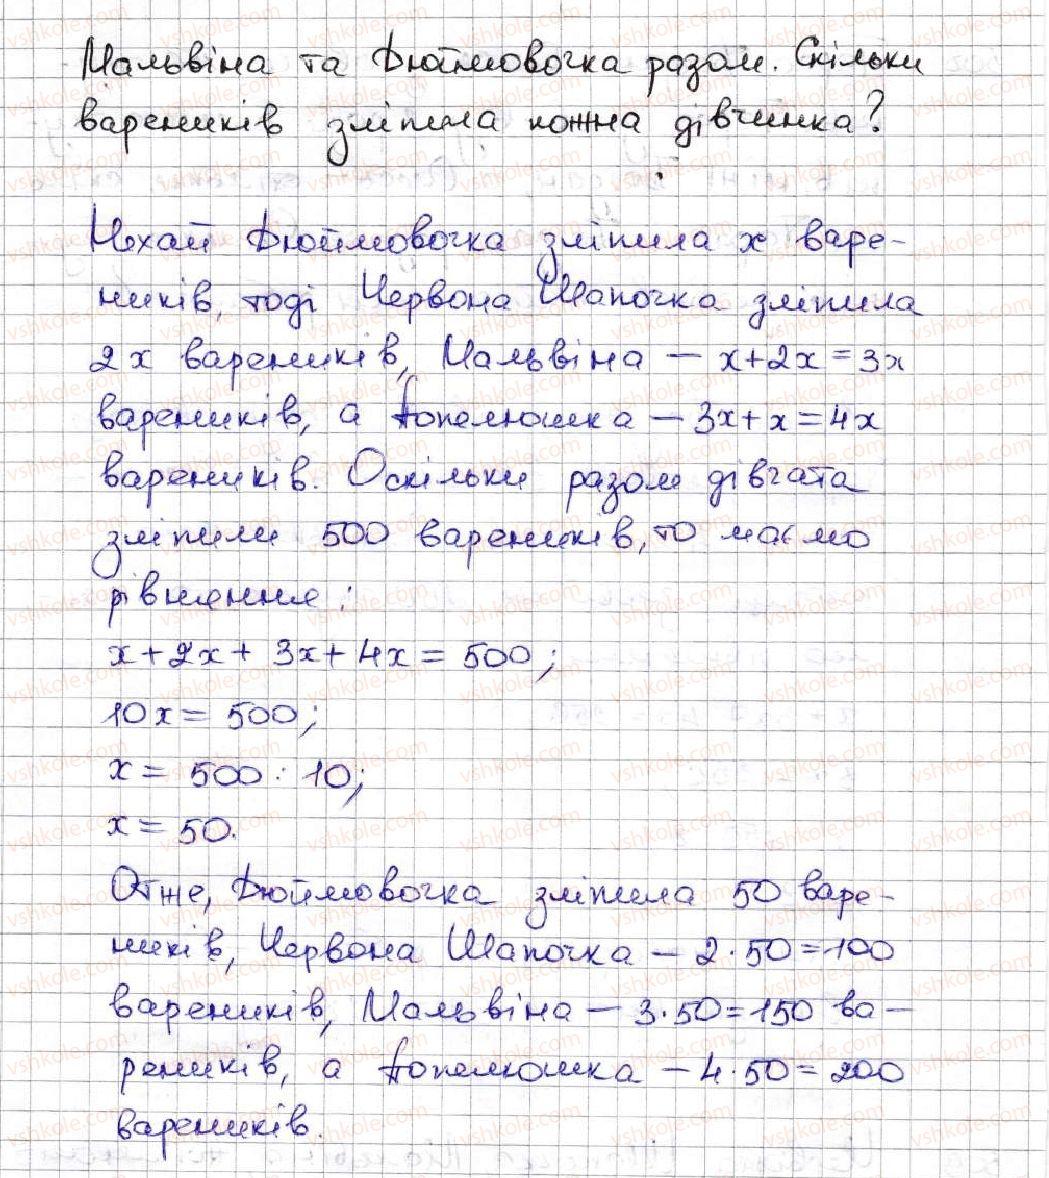 5-matematika-ag-merzlyak-vb-polonskij-ms-yakir-2013--3-mnozhennya-i-dilennya-naturalnih-chisel-18-dilennya-509-rnd4869.jpg